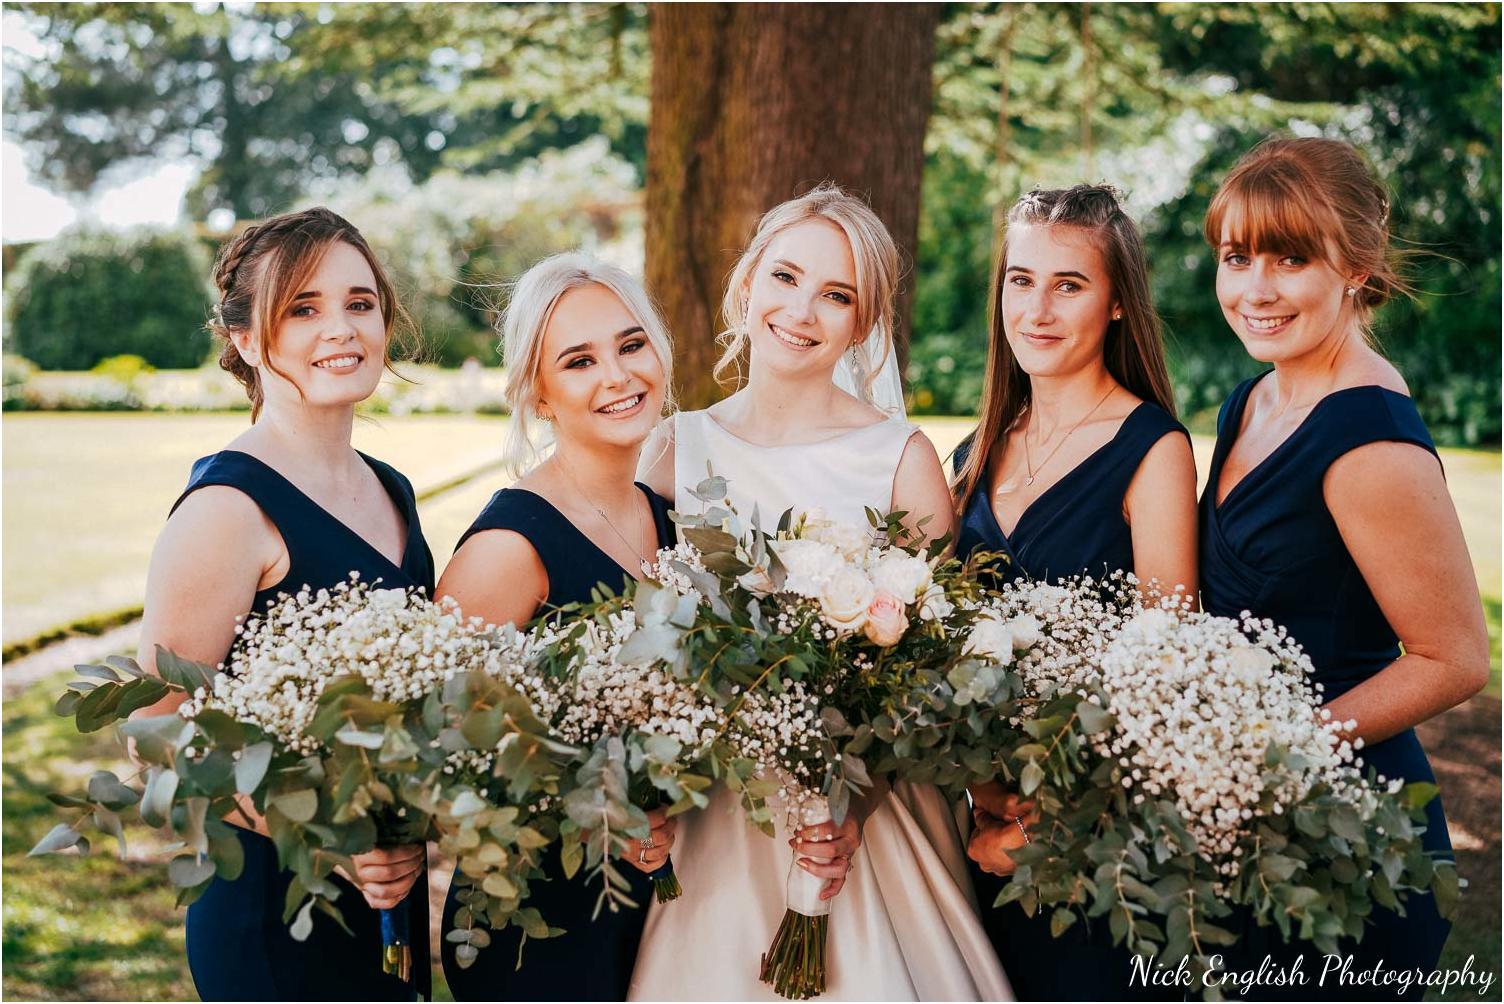 Eaves_Hall_Outdoor_Wedding_Photograph-52.jpg